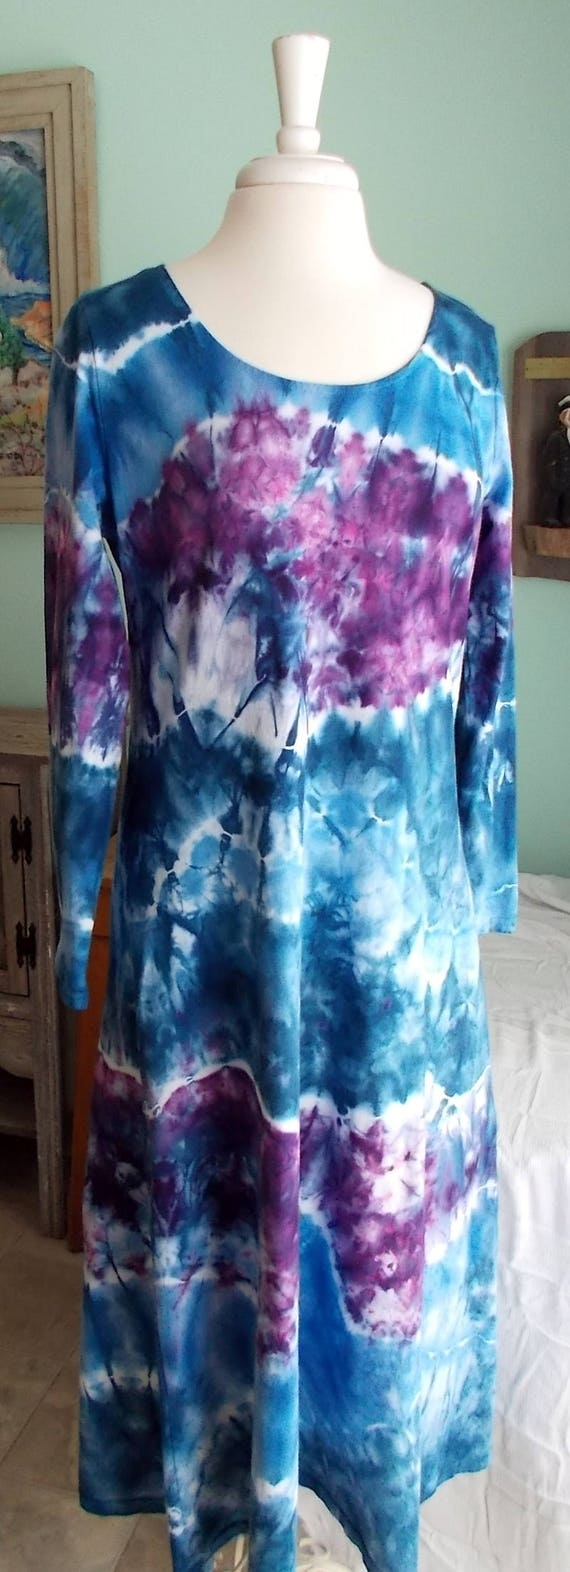 Large Ice dye tie dye Long Sleeve Cotton Dress